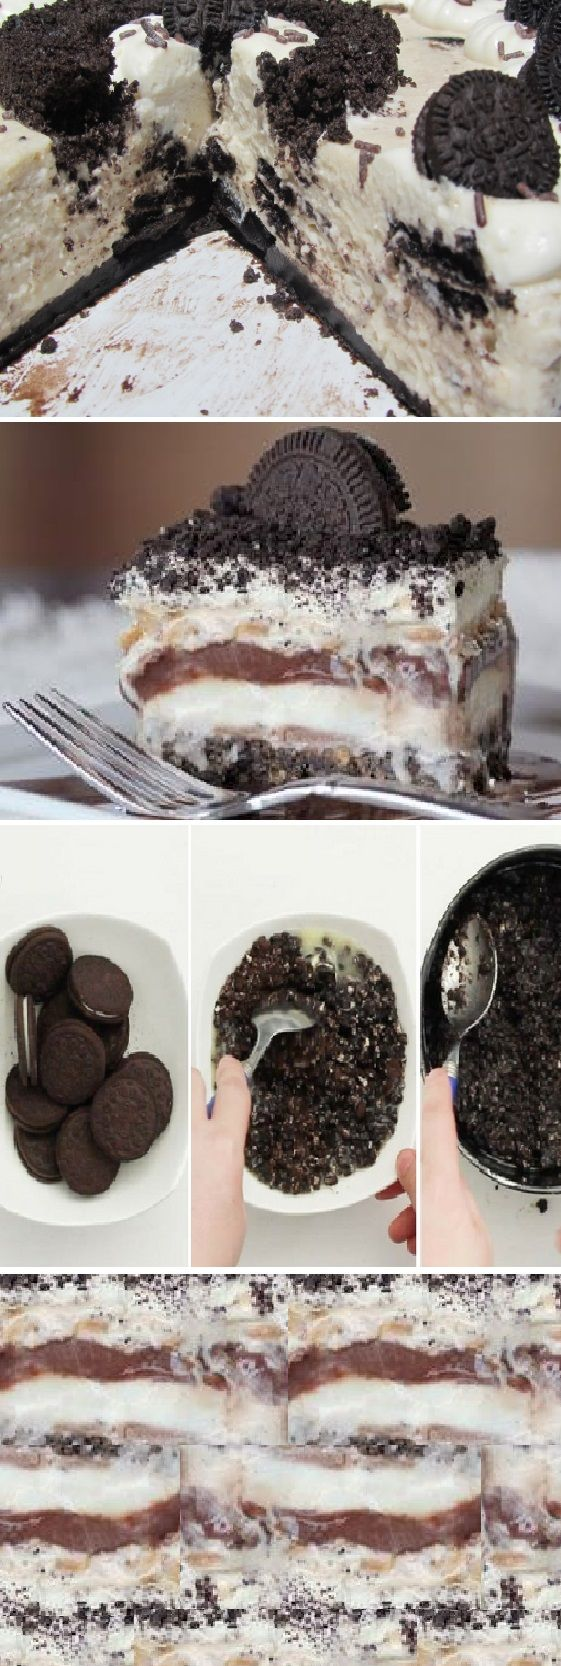 TORTA FRIA DE GALLETAS OREO, muy ´practica y facil de preparar. #oreo #galletas #postres #cakes #dulces #receta #recipe #casero #torta #tartas #pastel #nestlecocina #bizcocho #bizcochuelo #tasty #cocina #chocolate #pan #panes Si te gusta dinos HOLA y dale a Me Gusta MIREN …